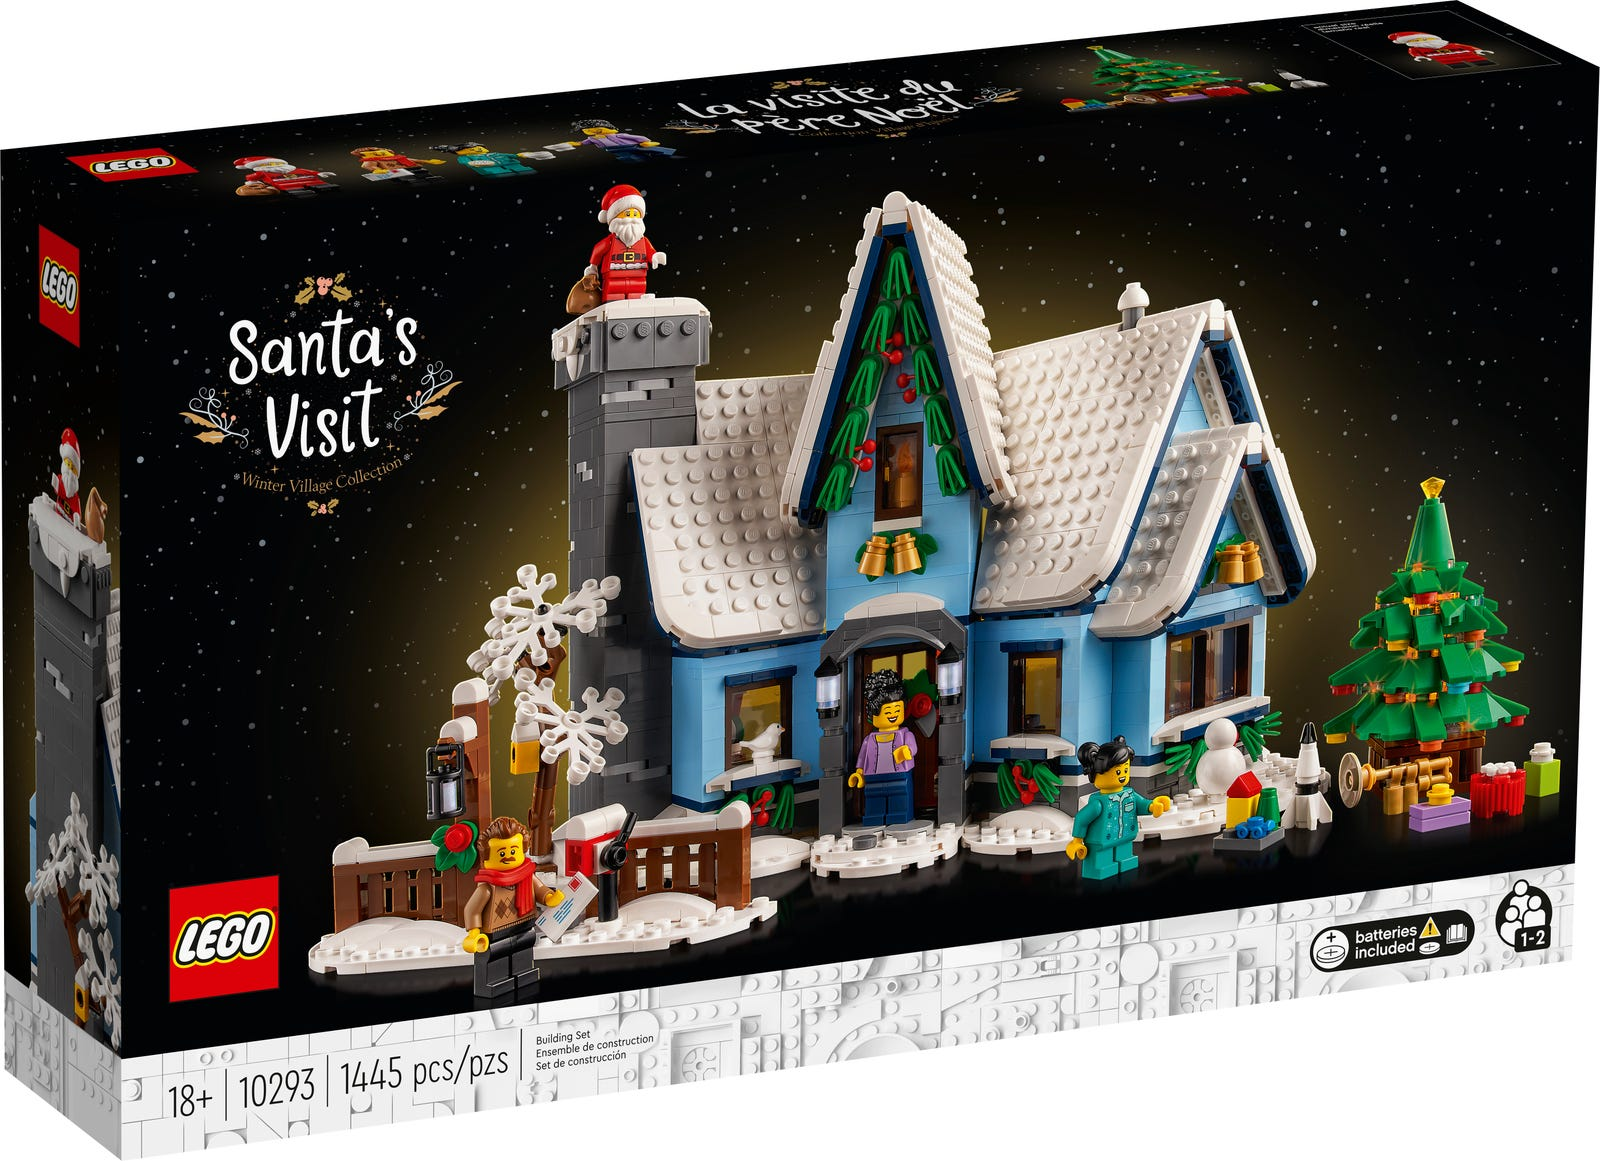 LEGO Santa Claus is visiting